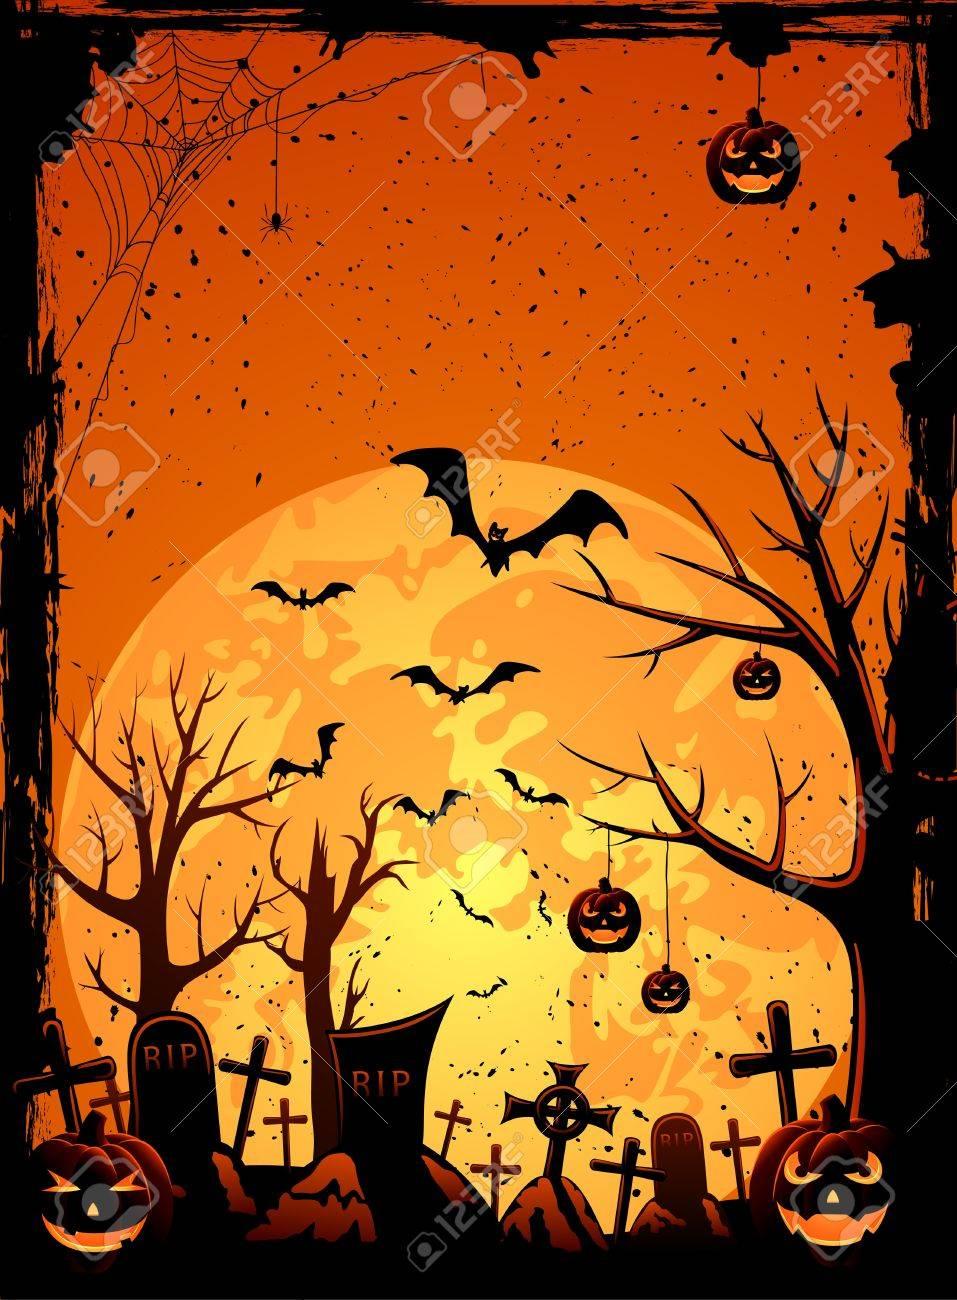 Grunge Halloween night background, illustration Stock Vector - 15218494